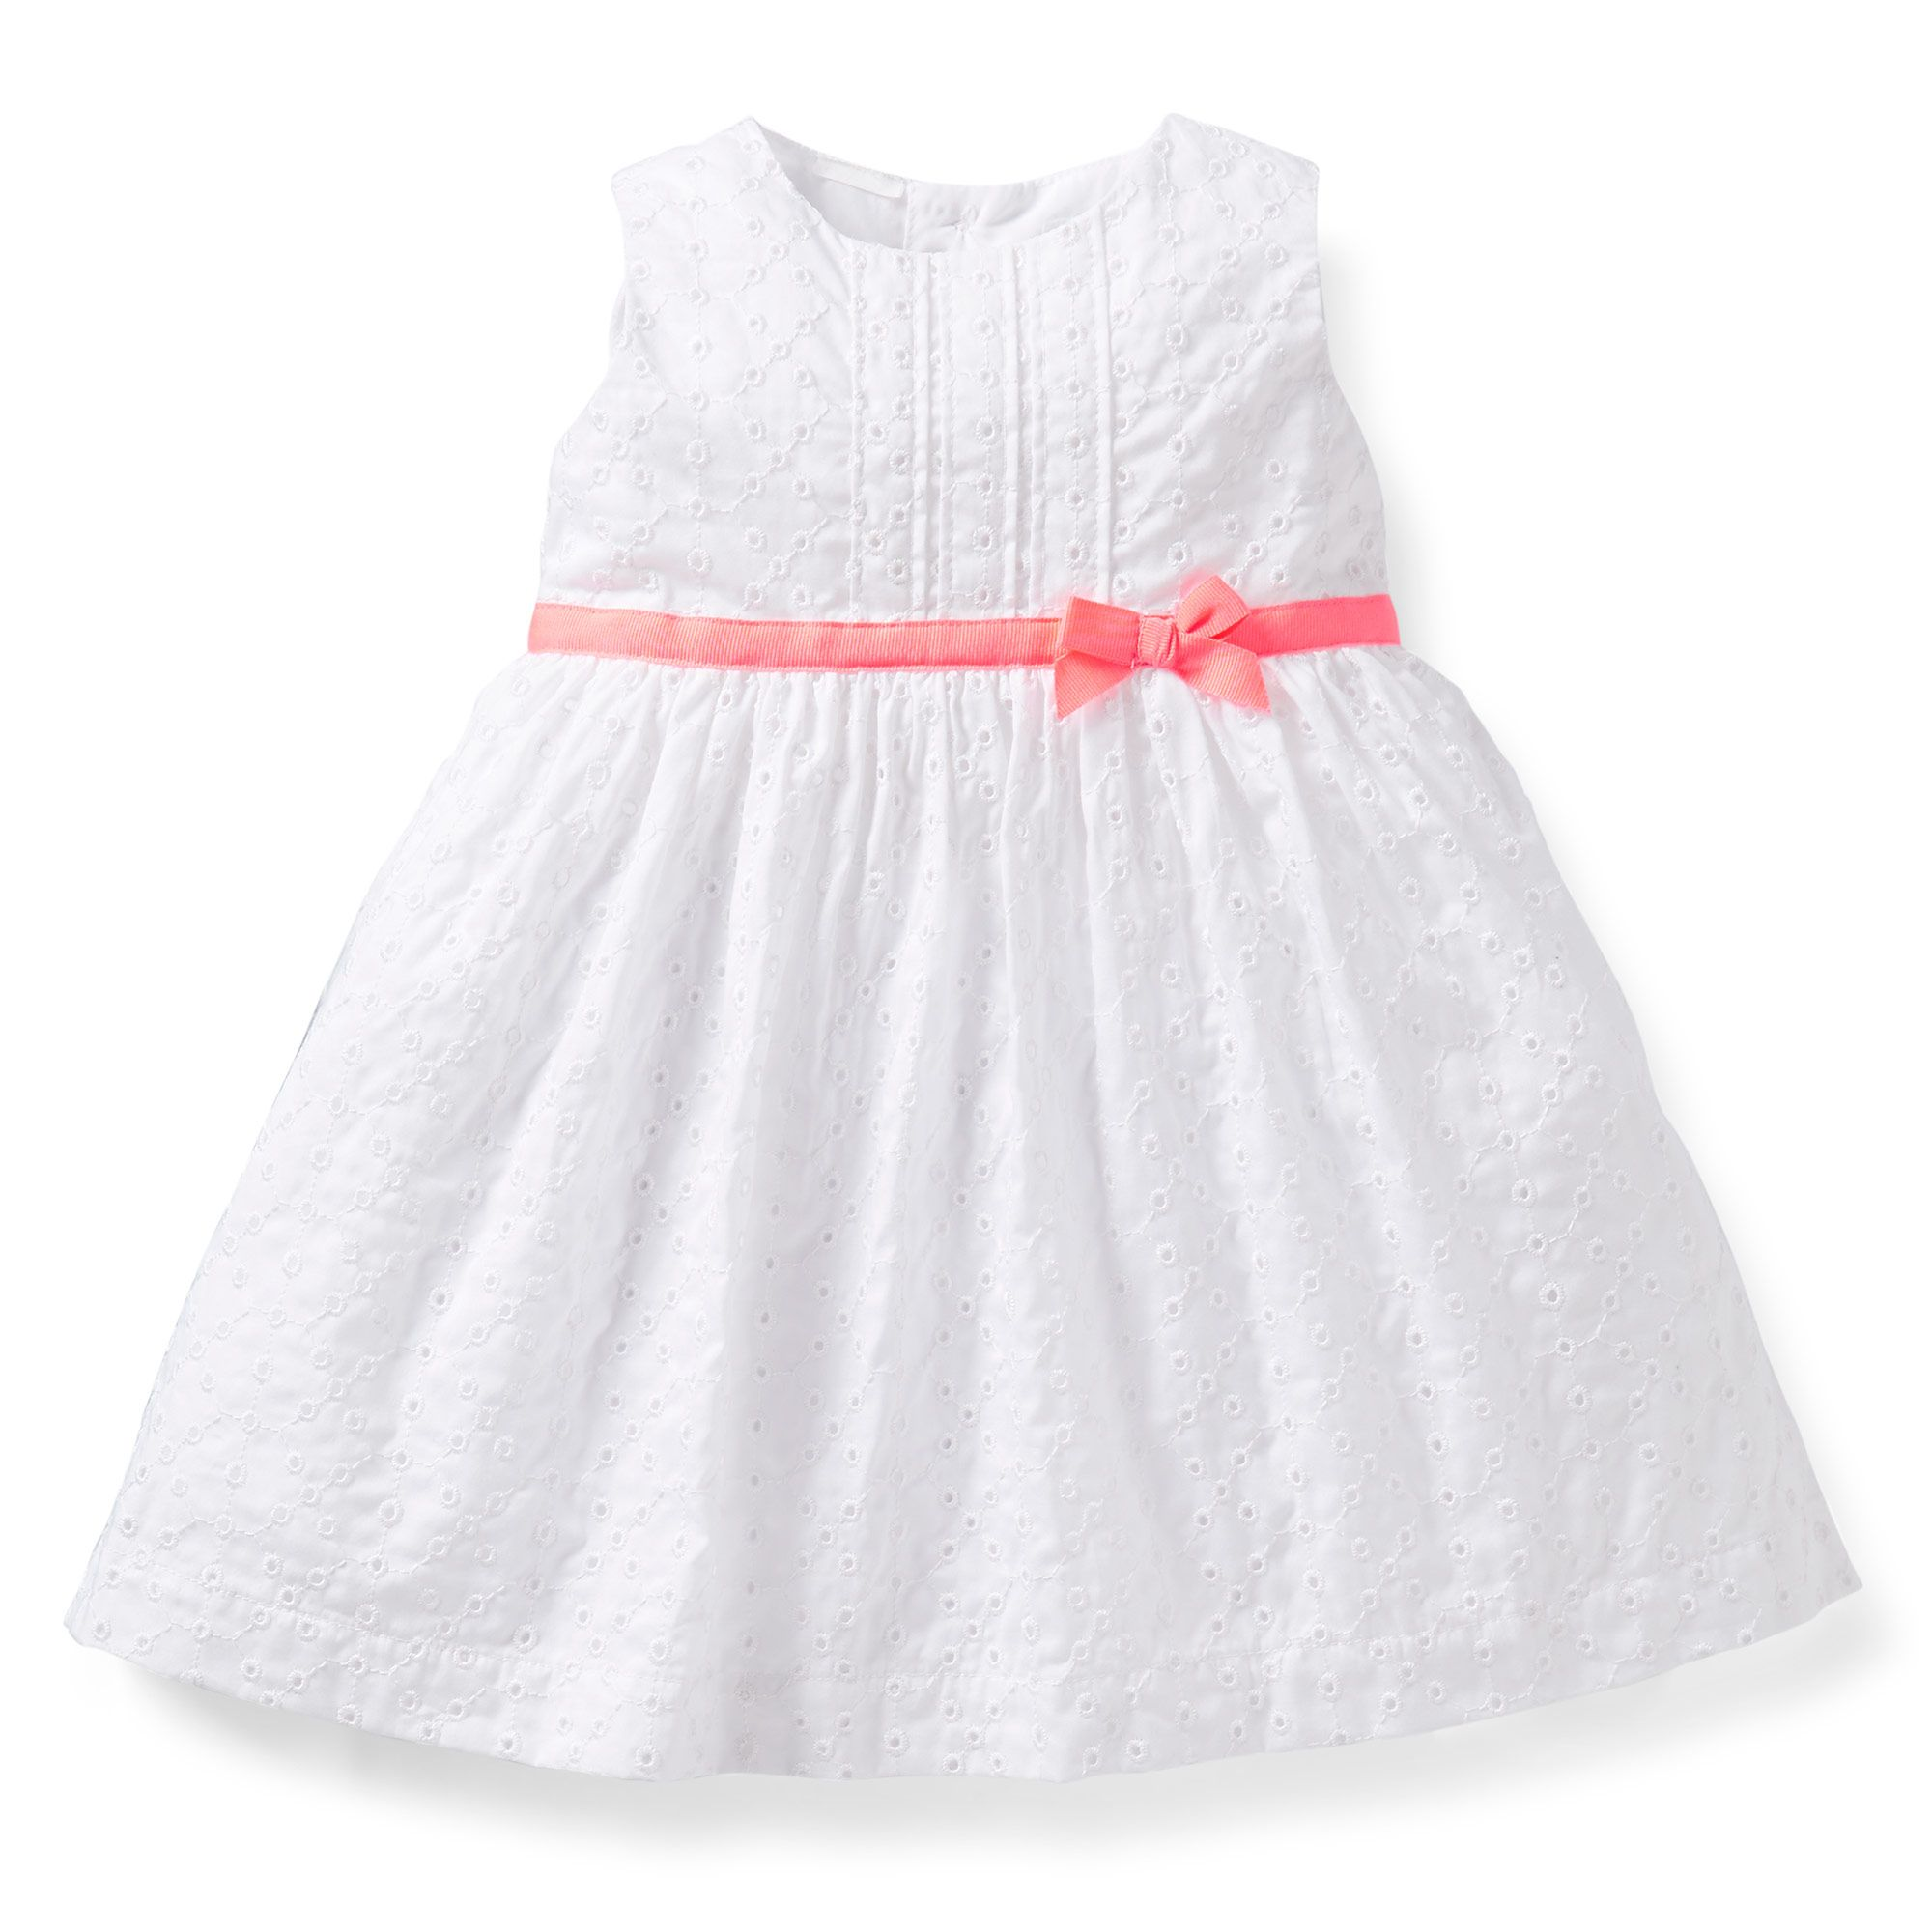 Eyelet Dress Set Carter S Girl Outfits Carters Baby Girl Baby Girl Dresses [ 2000 x 2000 Pixel ]